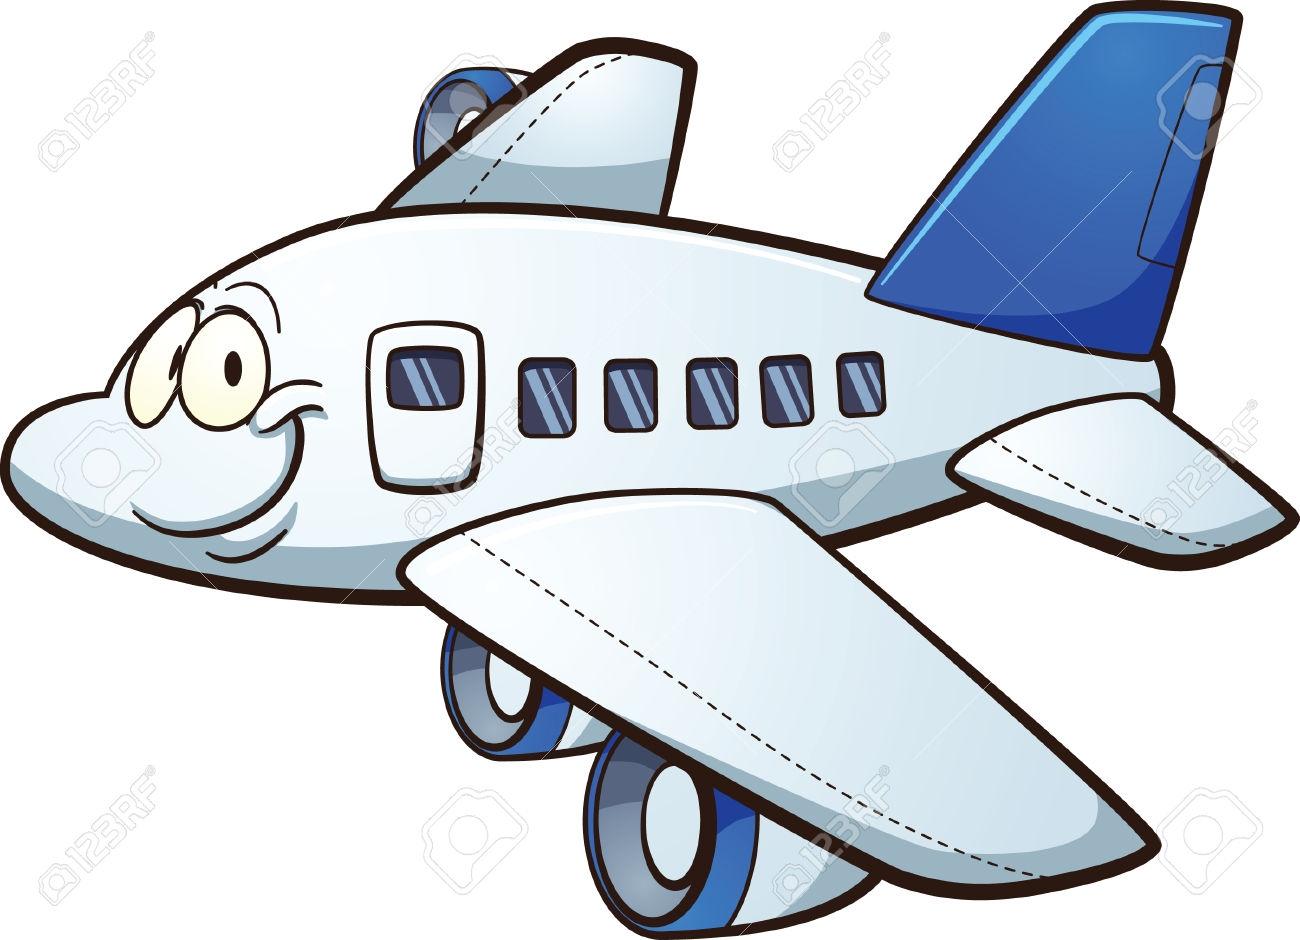 cartoon airplane clipart - Clipground